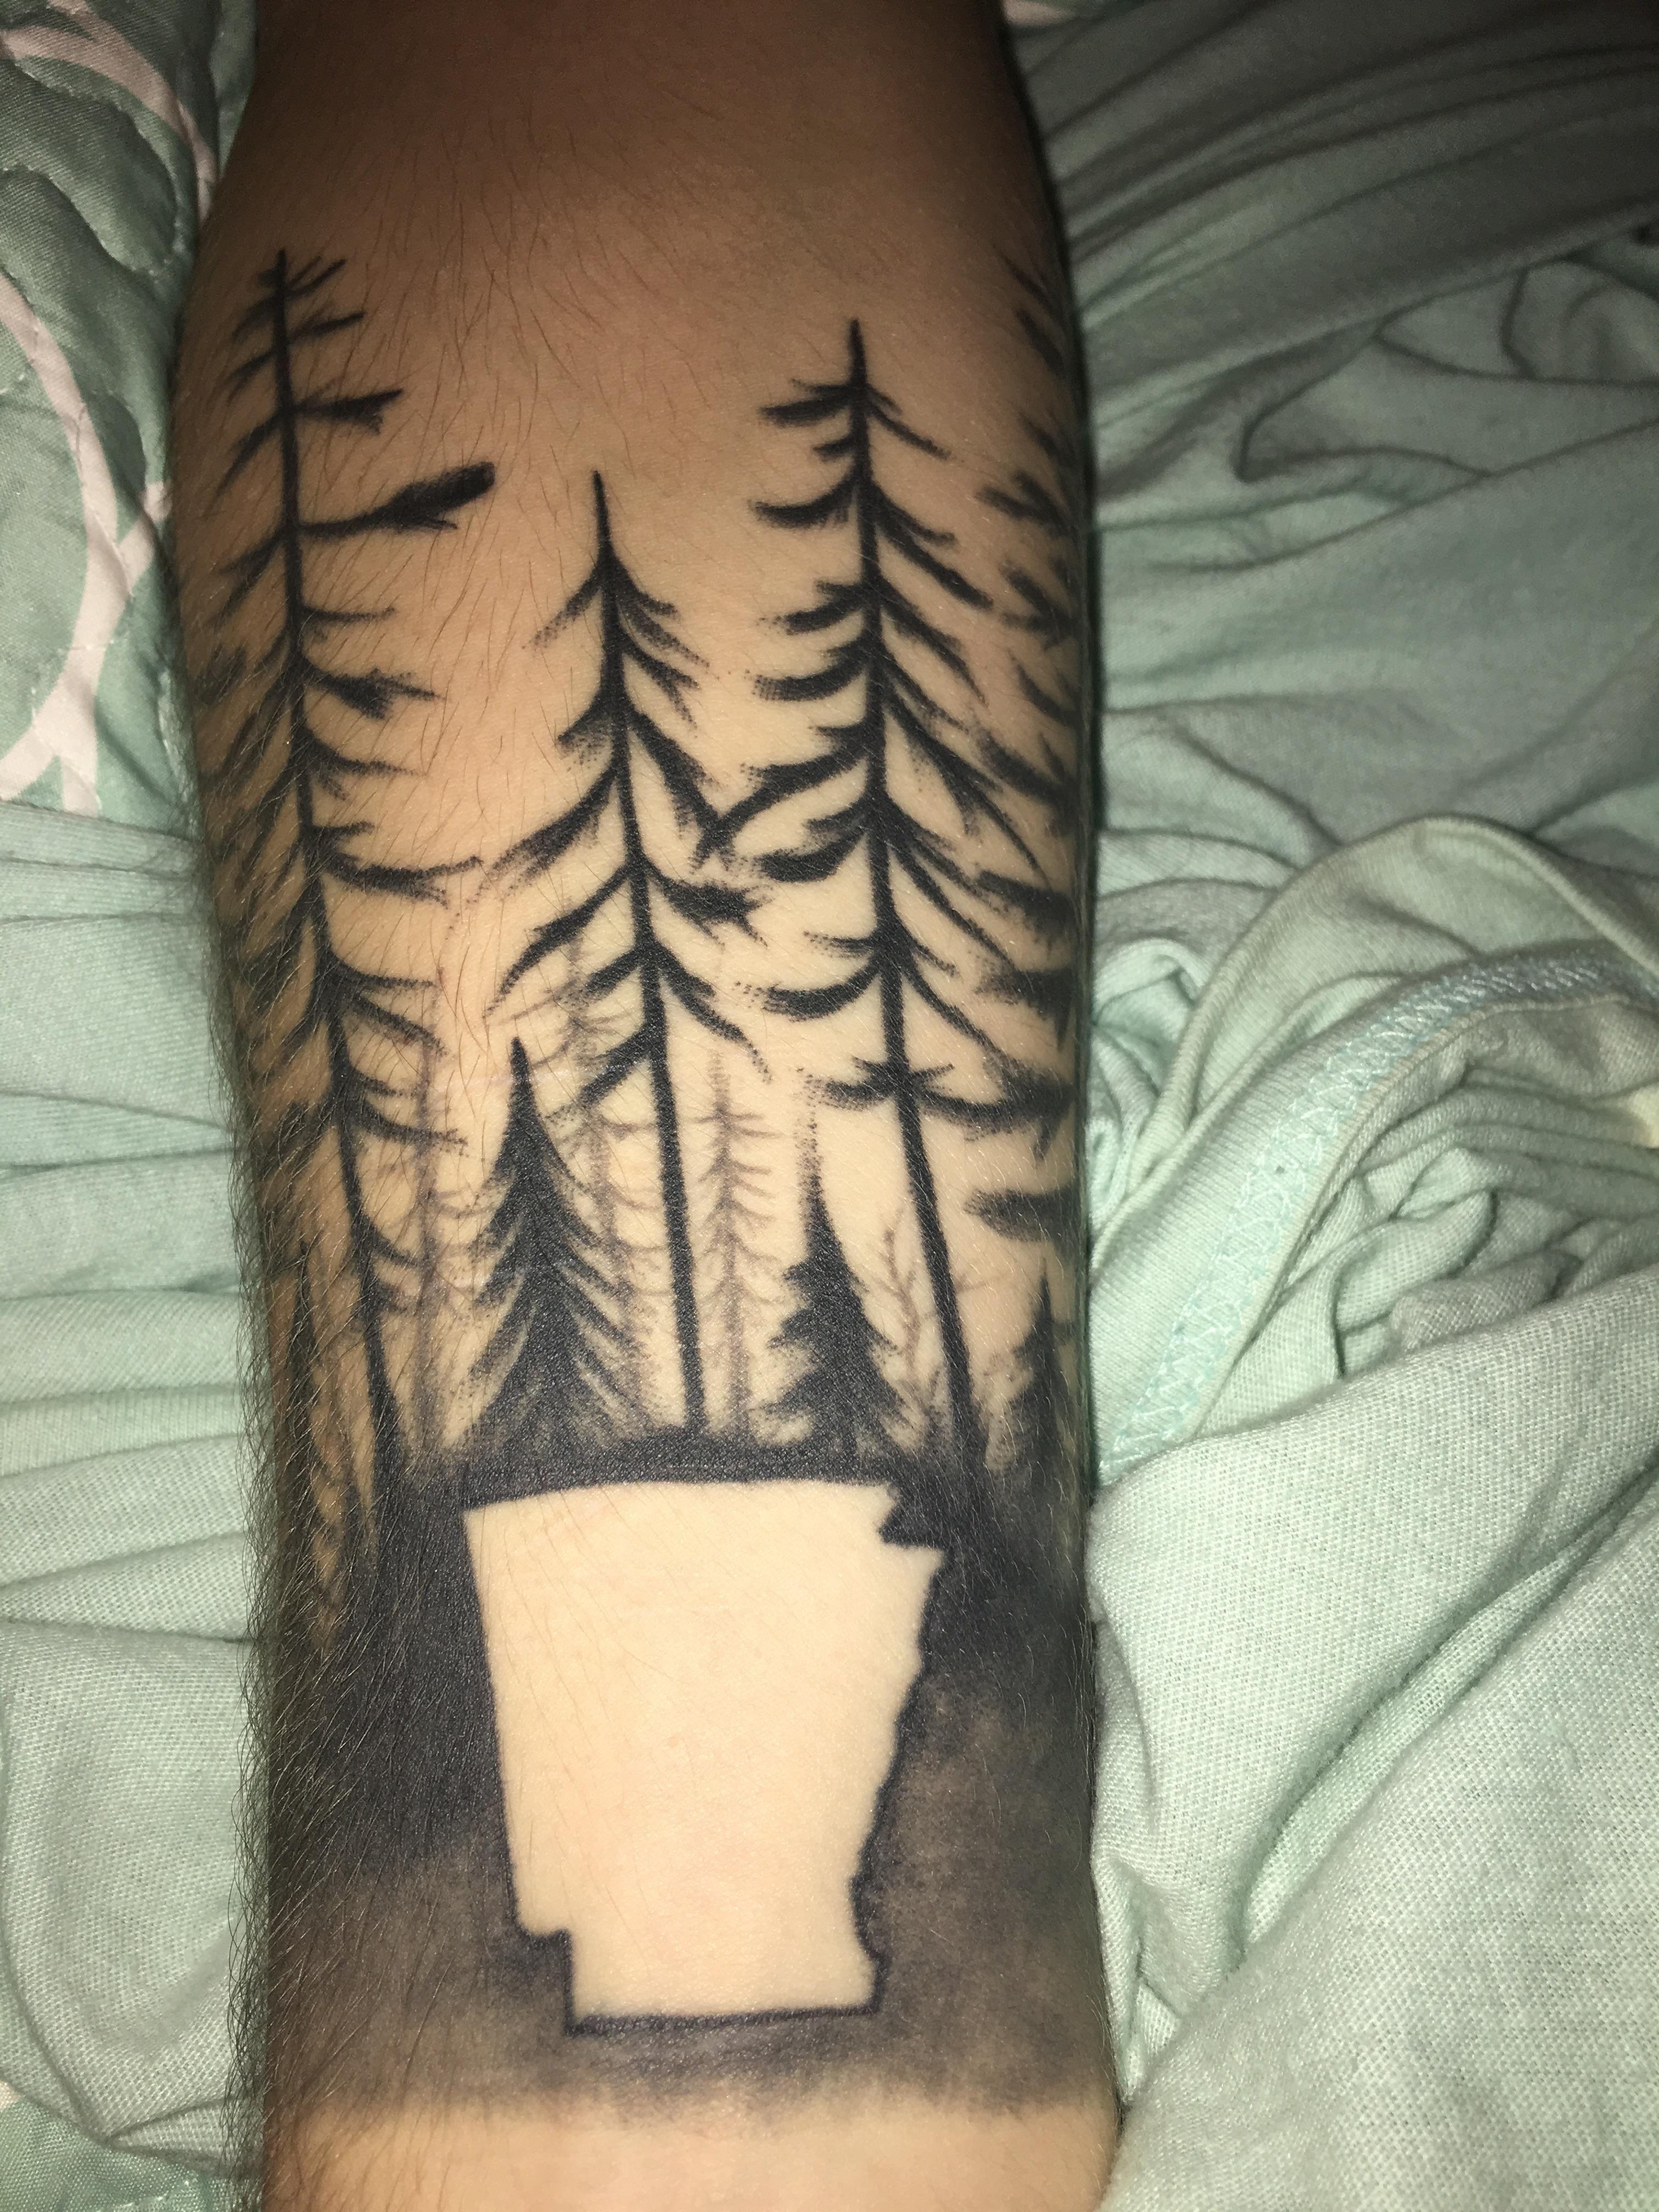 My sons Arkansas tattoo from 510 Tattoo in North Carolina